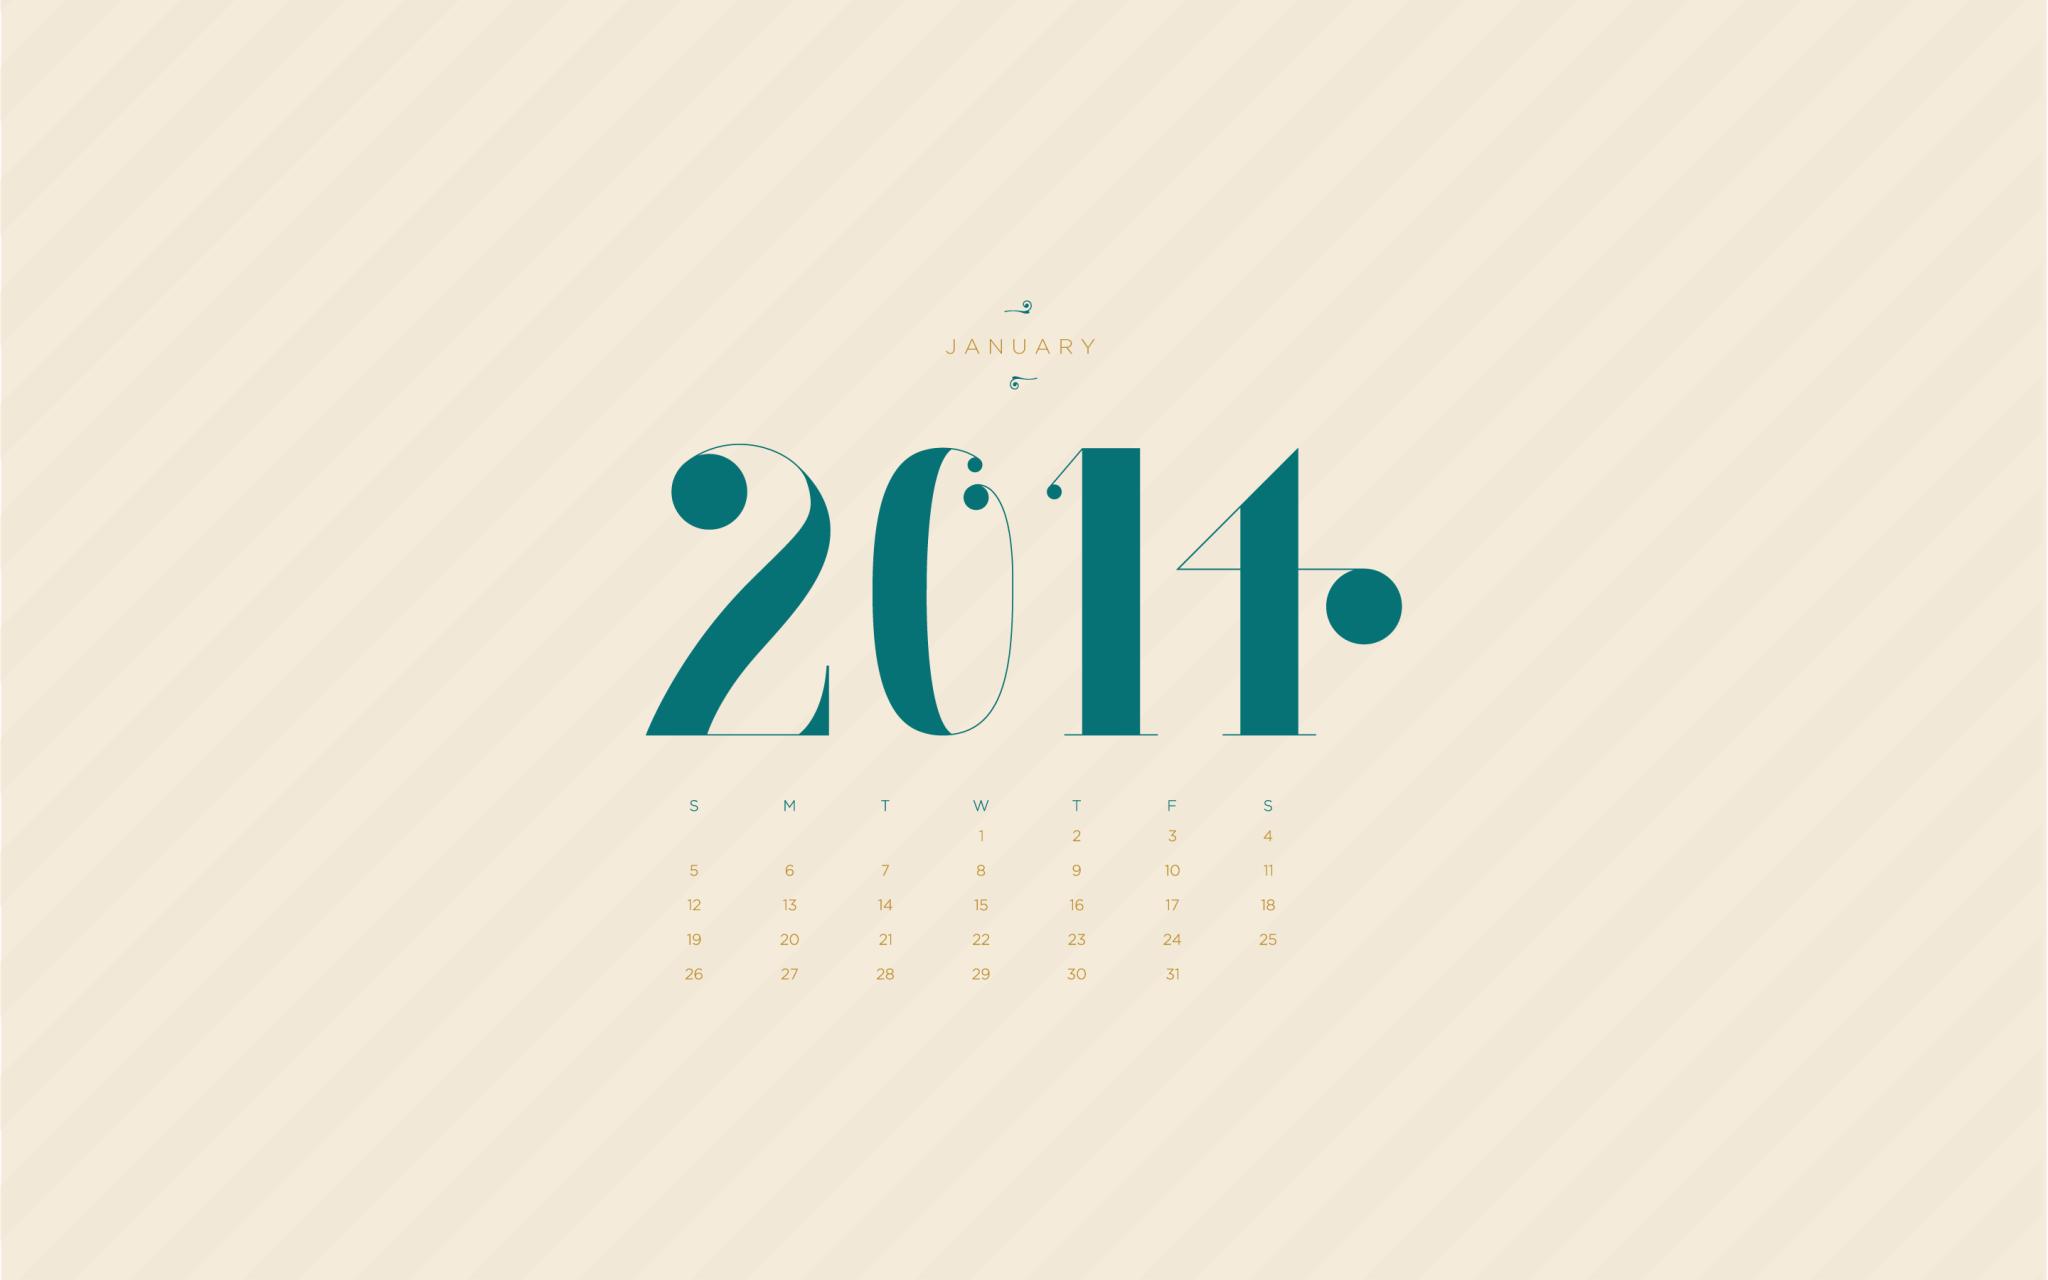 Digitale trends i 2014 #1